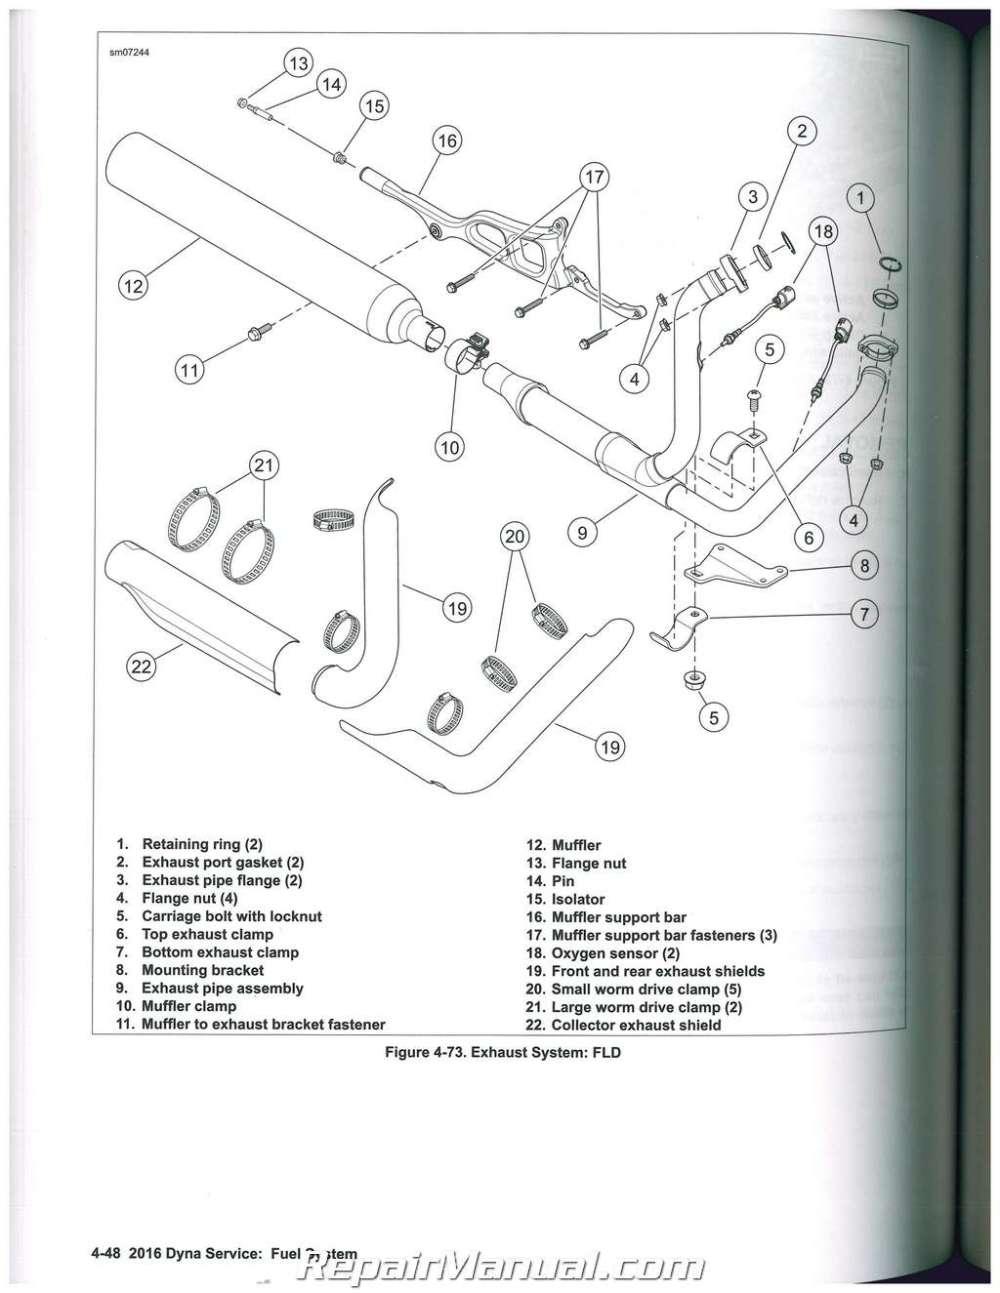 medium resolution of harley motorcycle engine part diagram